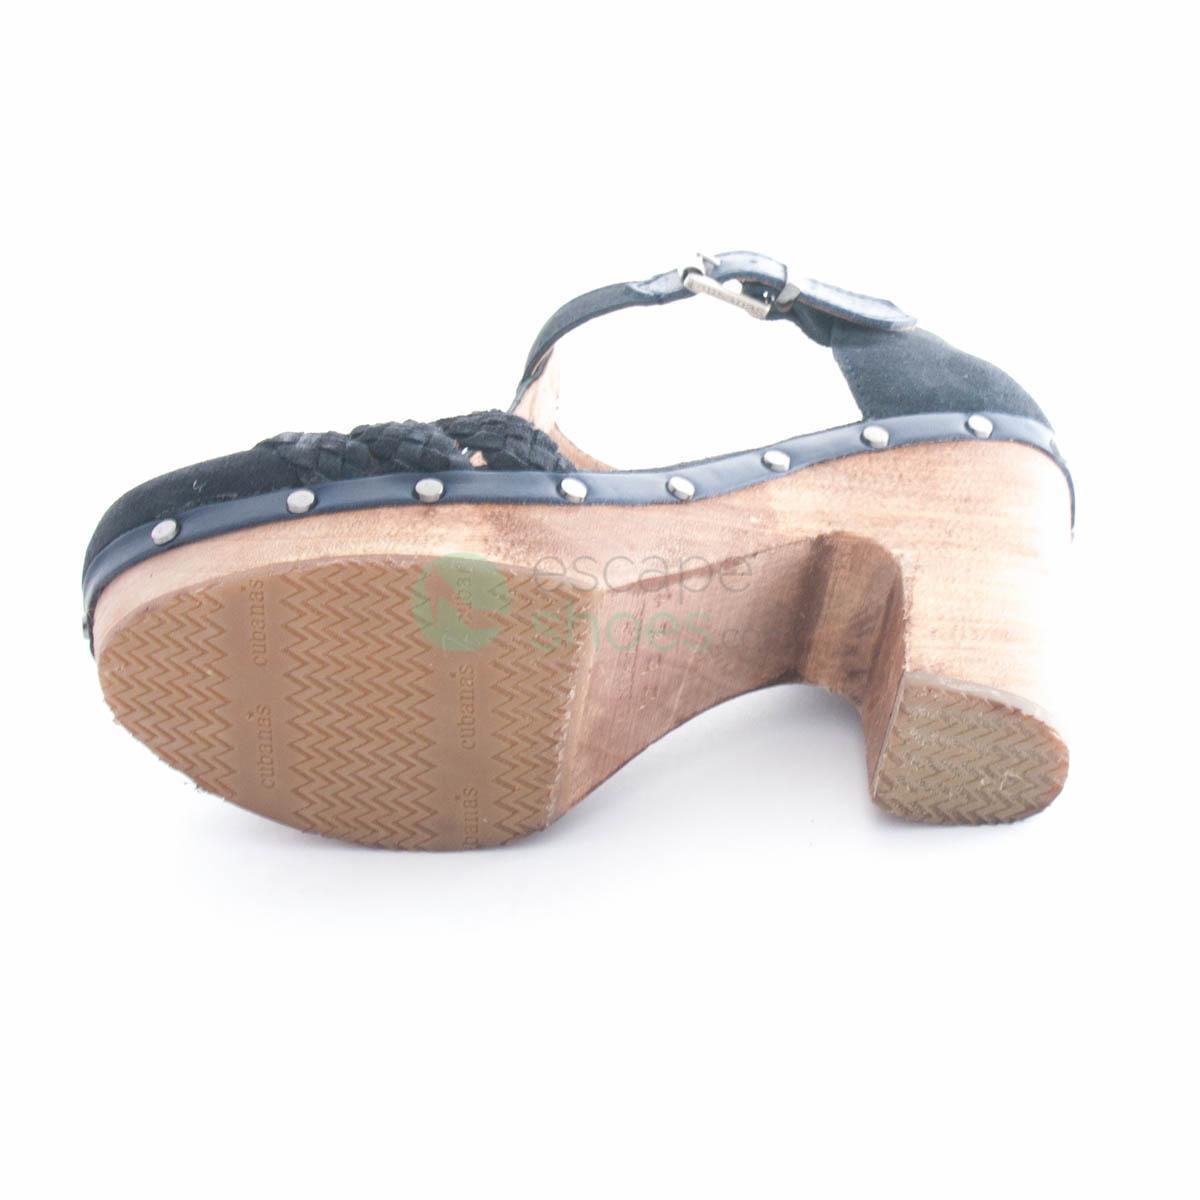 SANDALIA CUBANAS WILD700 MIDNIGHT BLUE   Cubanas Shoes